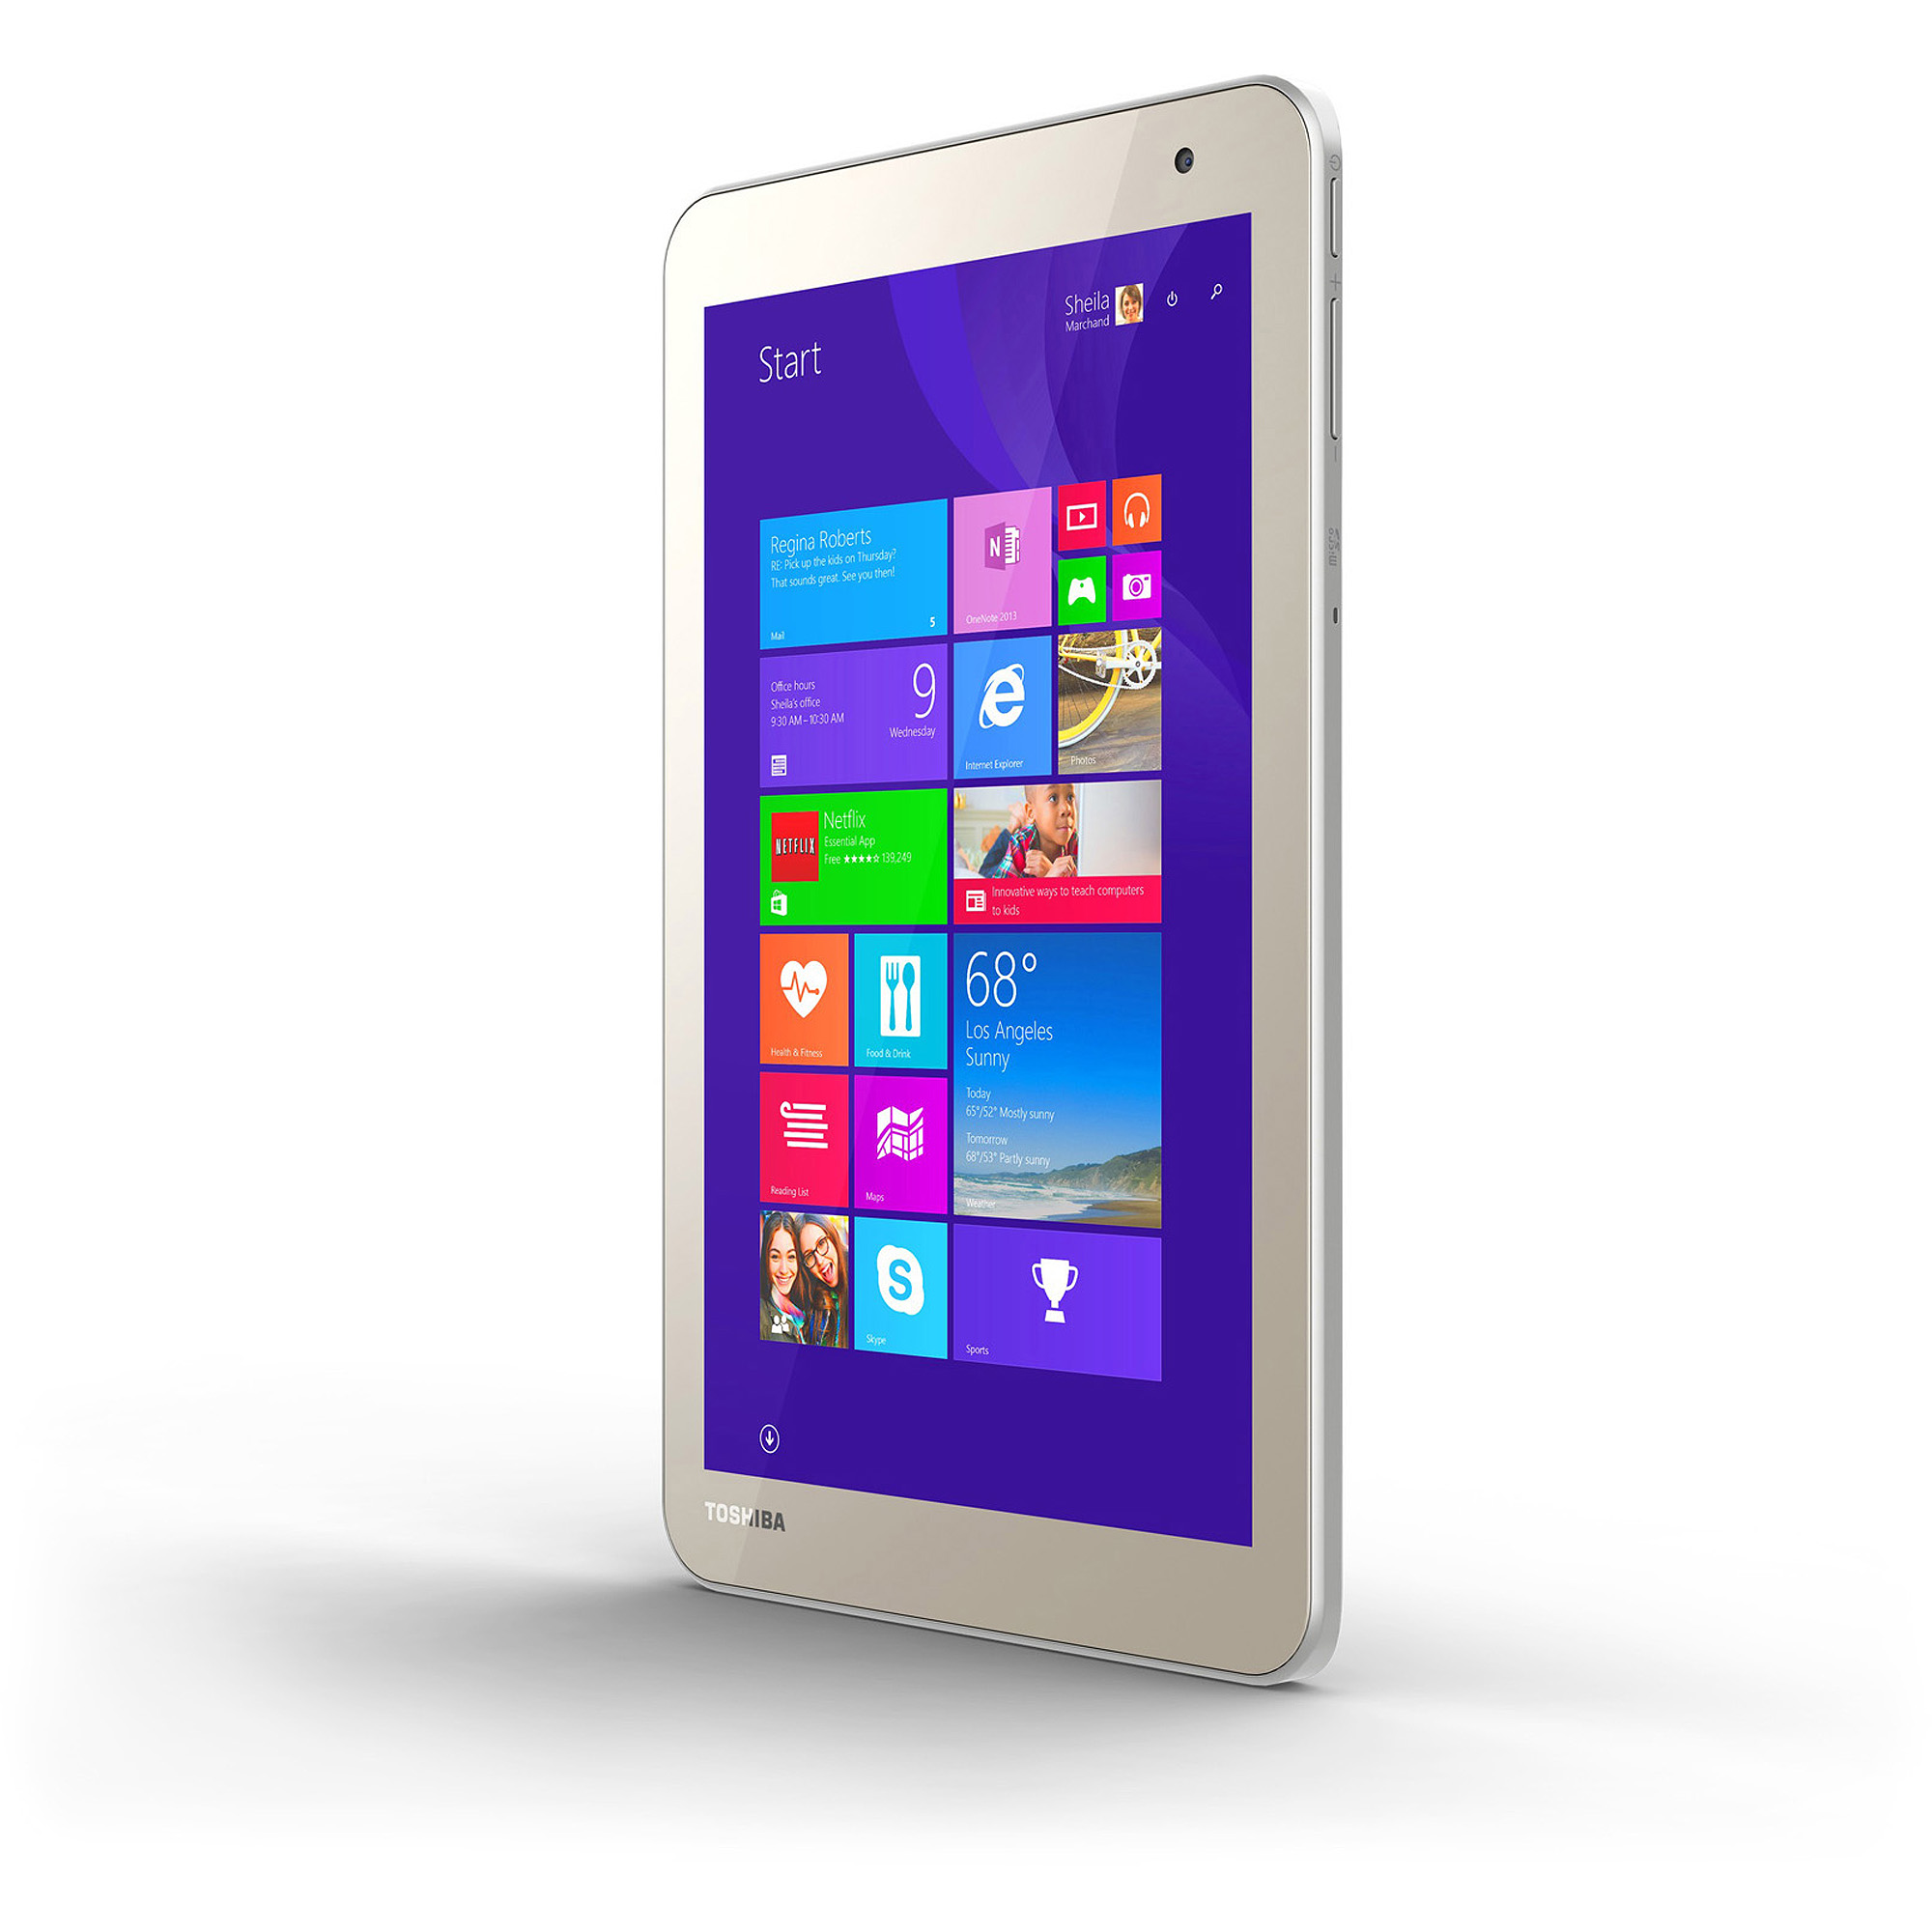 "Toshiba Encore 2 8"" Tablet 64GB Intel Atom Z3735F Quad-Core Processor Windows 8.1, Matte Satin Gold"